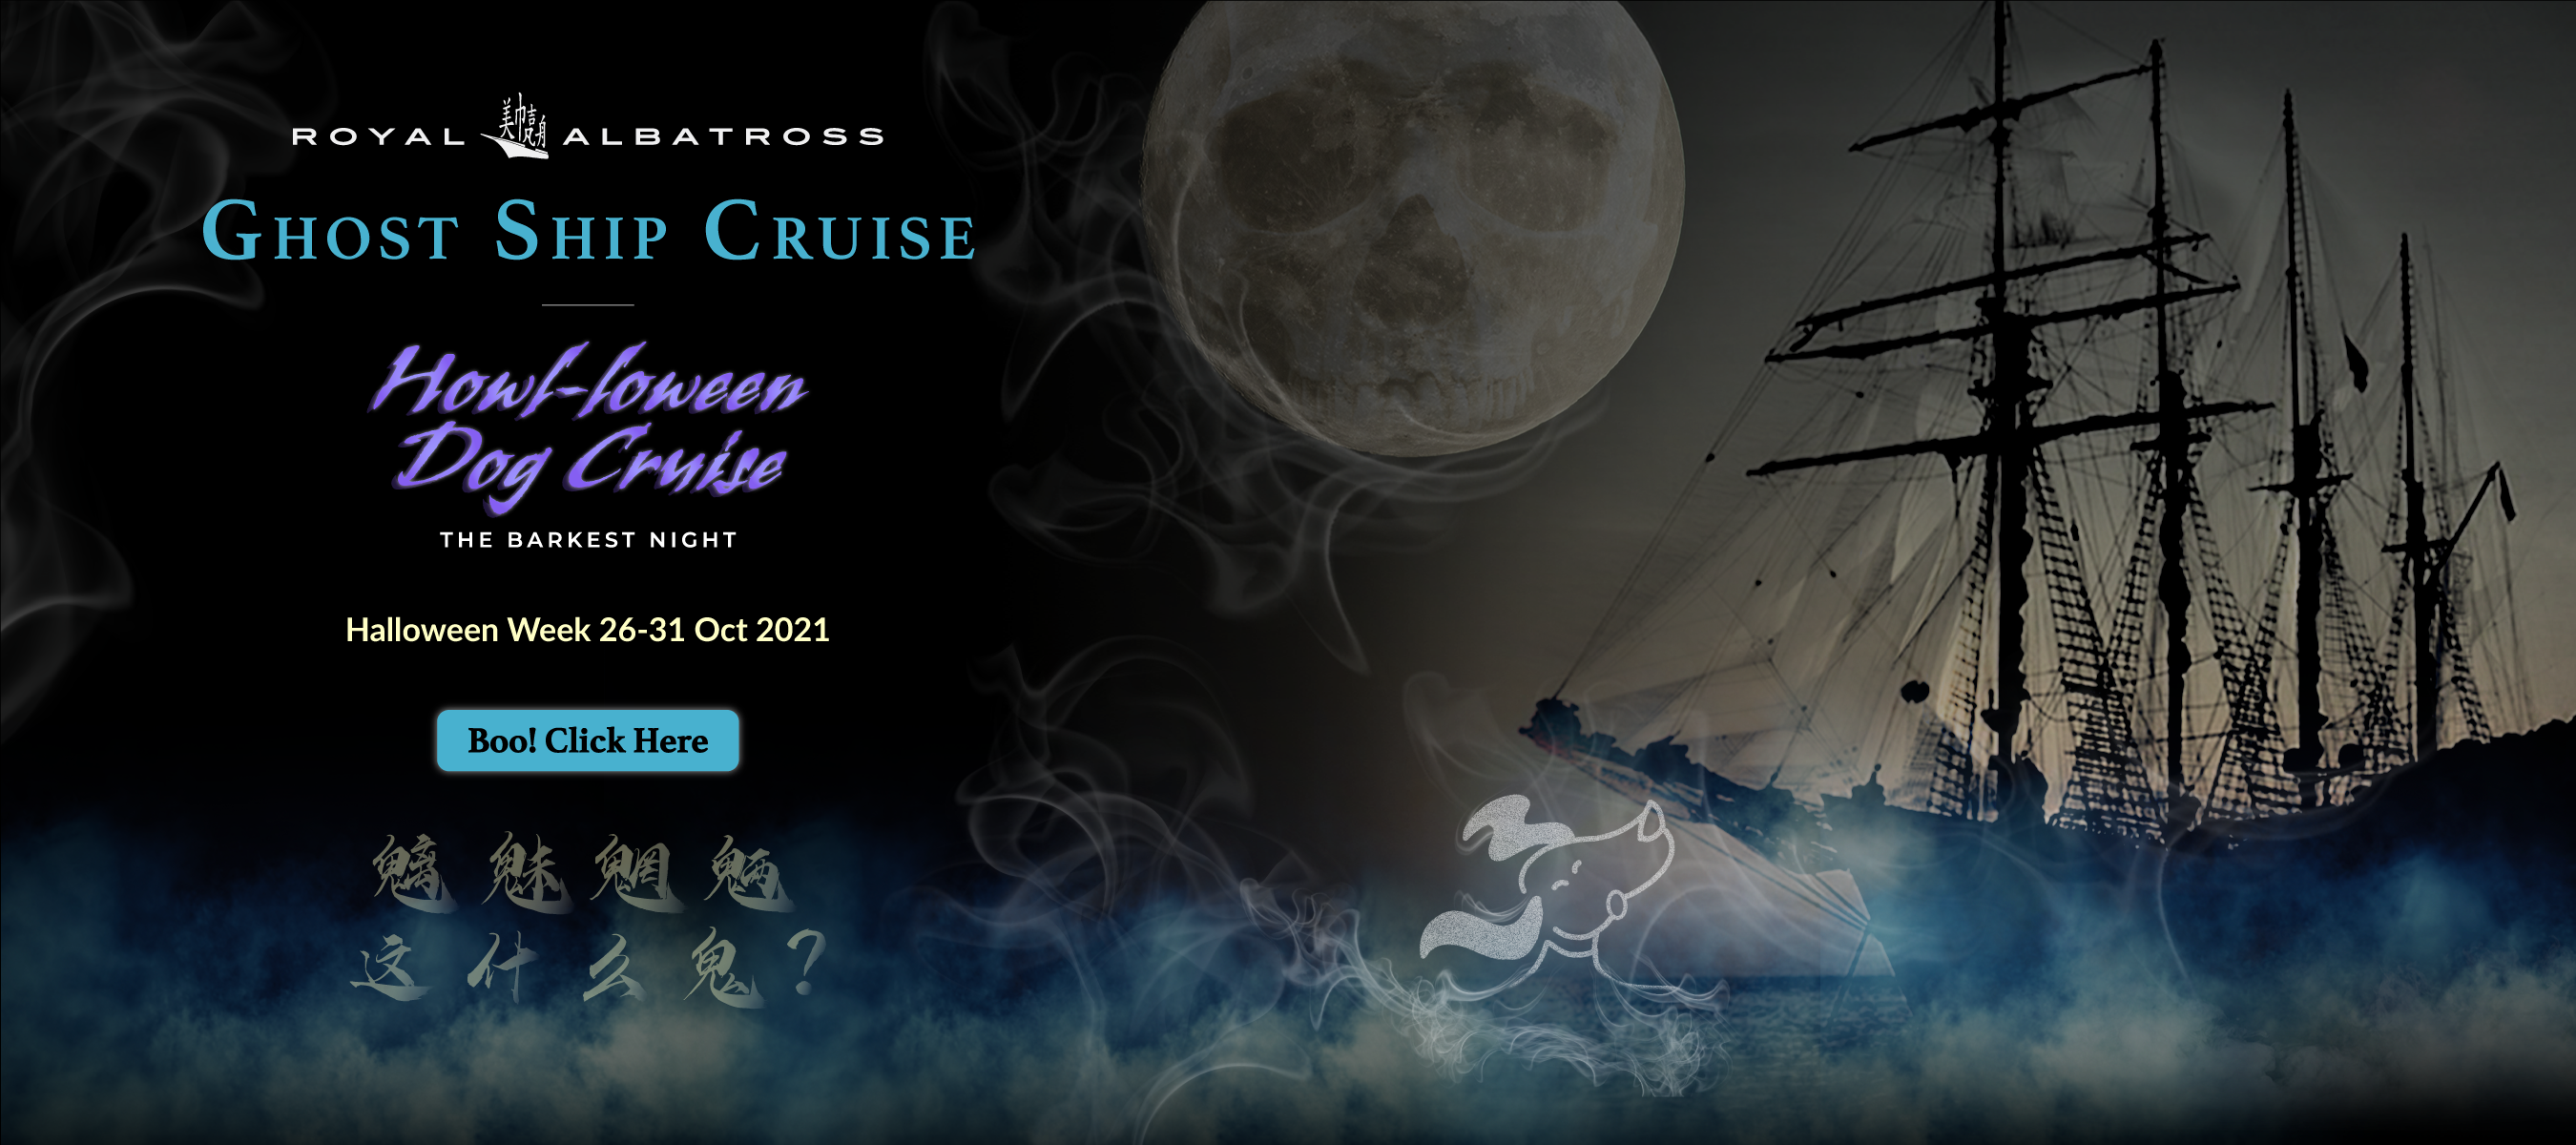 HalloweenKV2021_concepts_v2B_Website-banner_combine